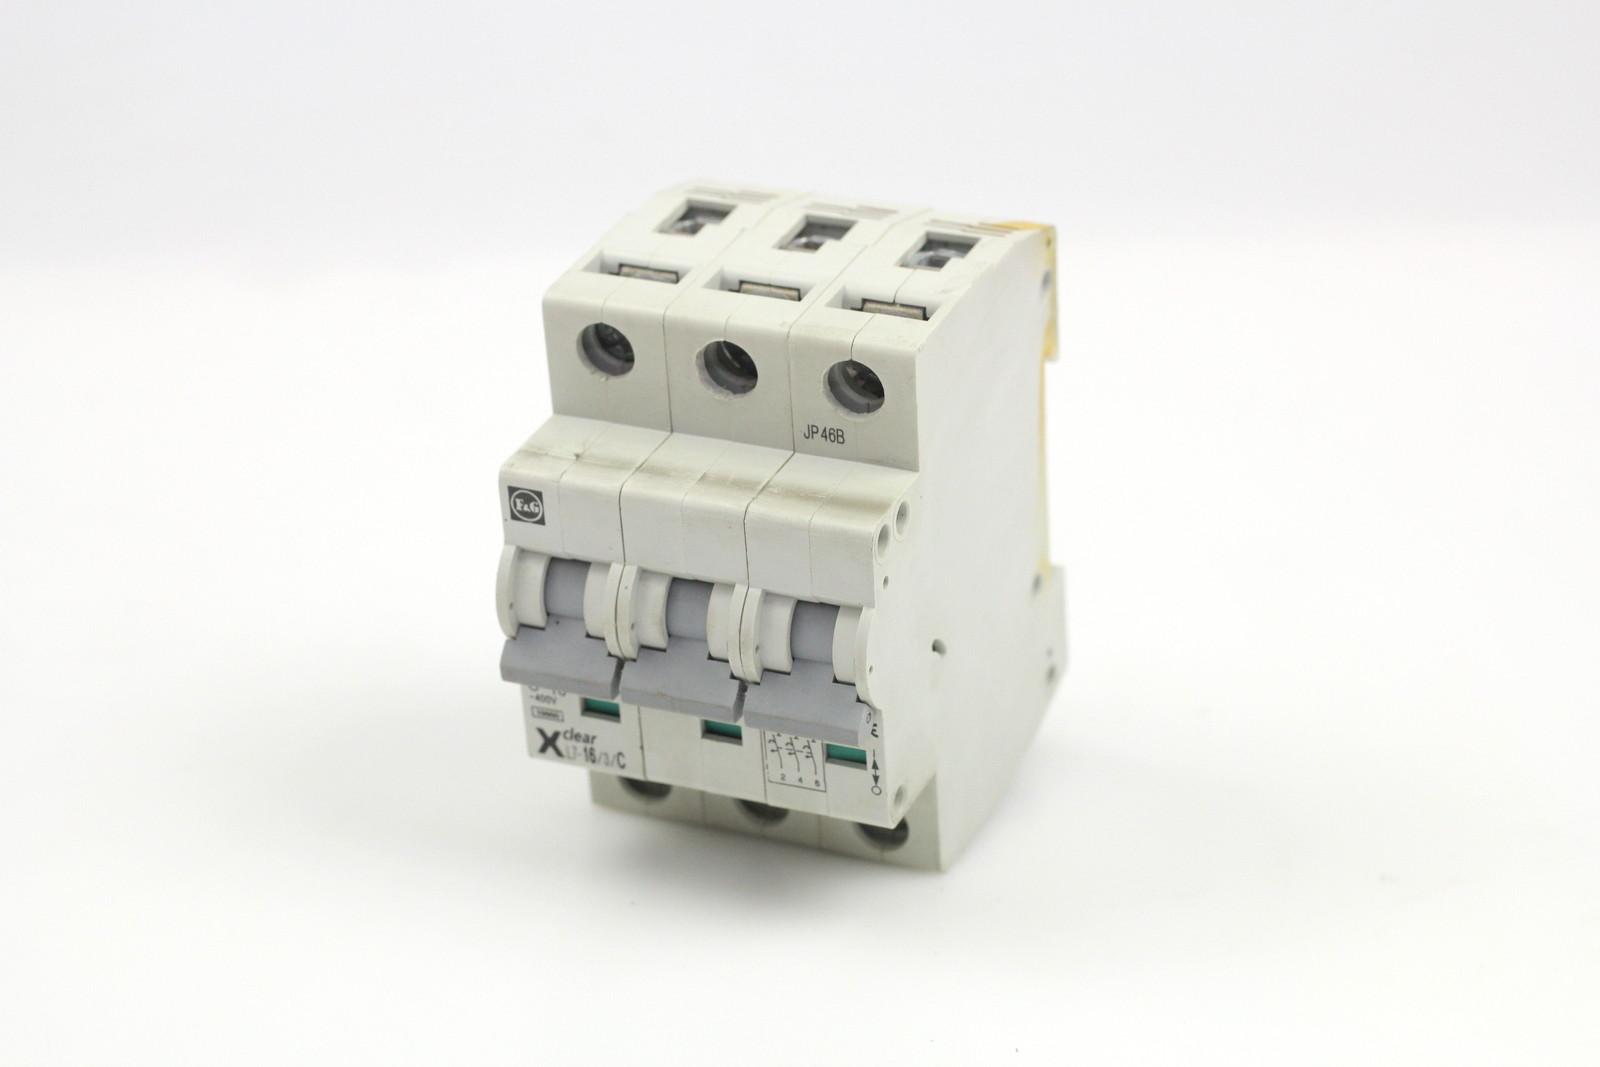 5pcs AC028 Arduino 5x40 pin Straight Pin Header 2.54mm Breakable